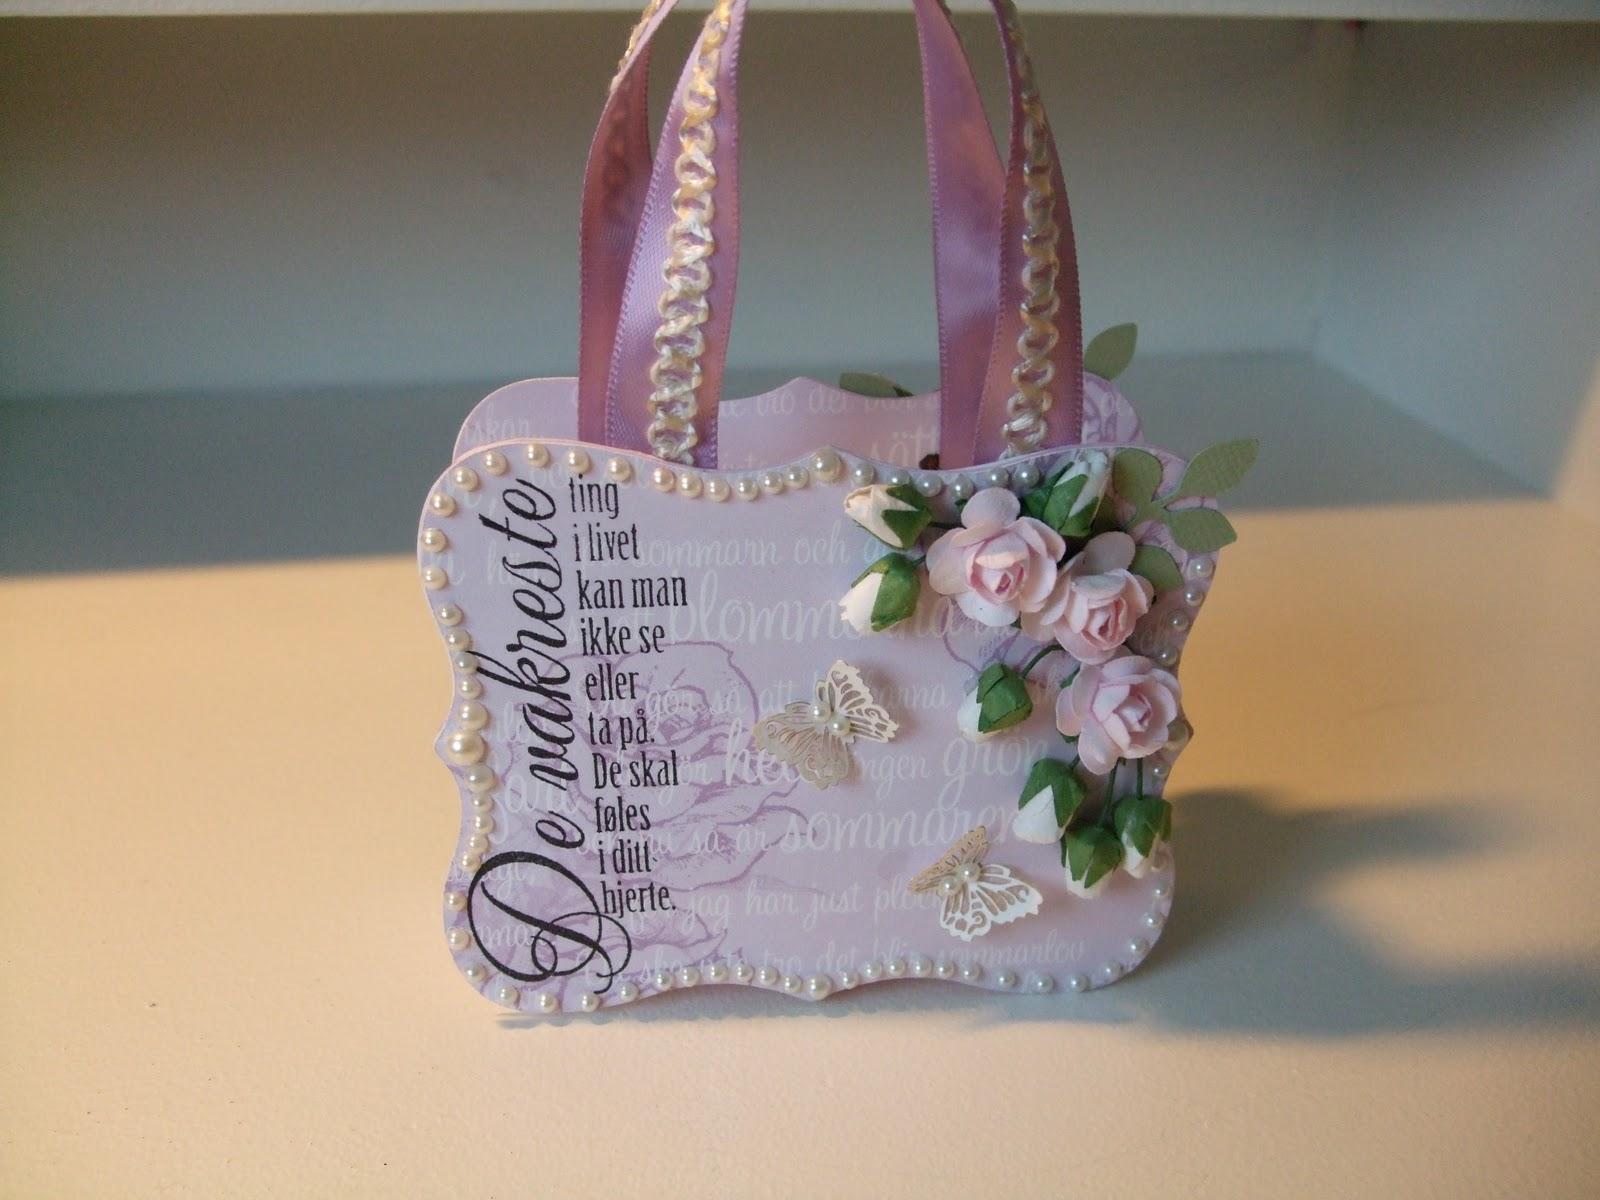 How-to-DIY-Handbag-Style-Paper-Gift-Basket-12.jpg